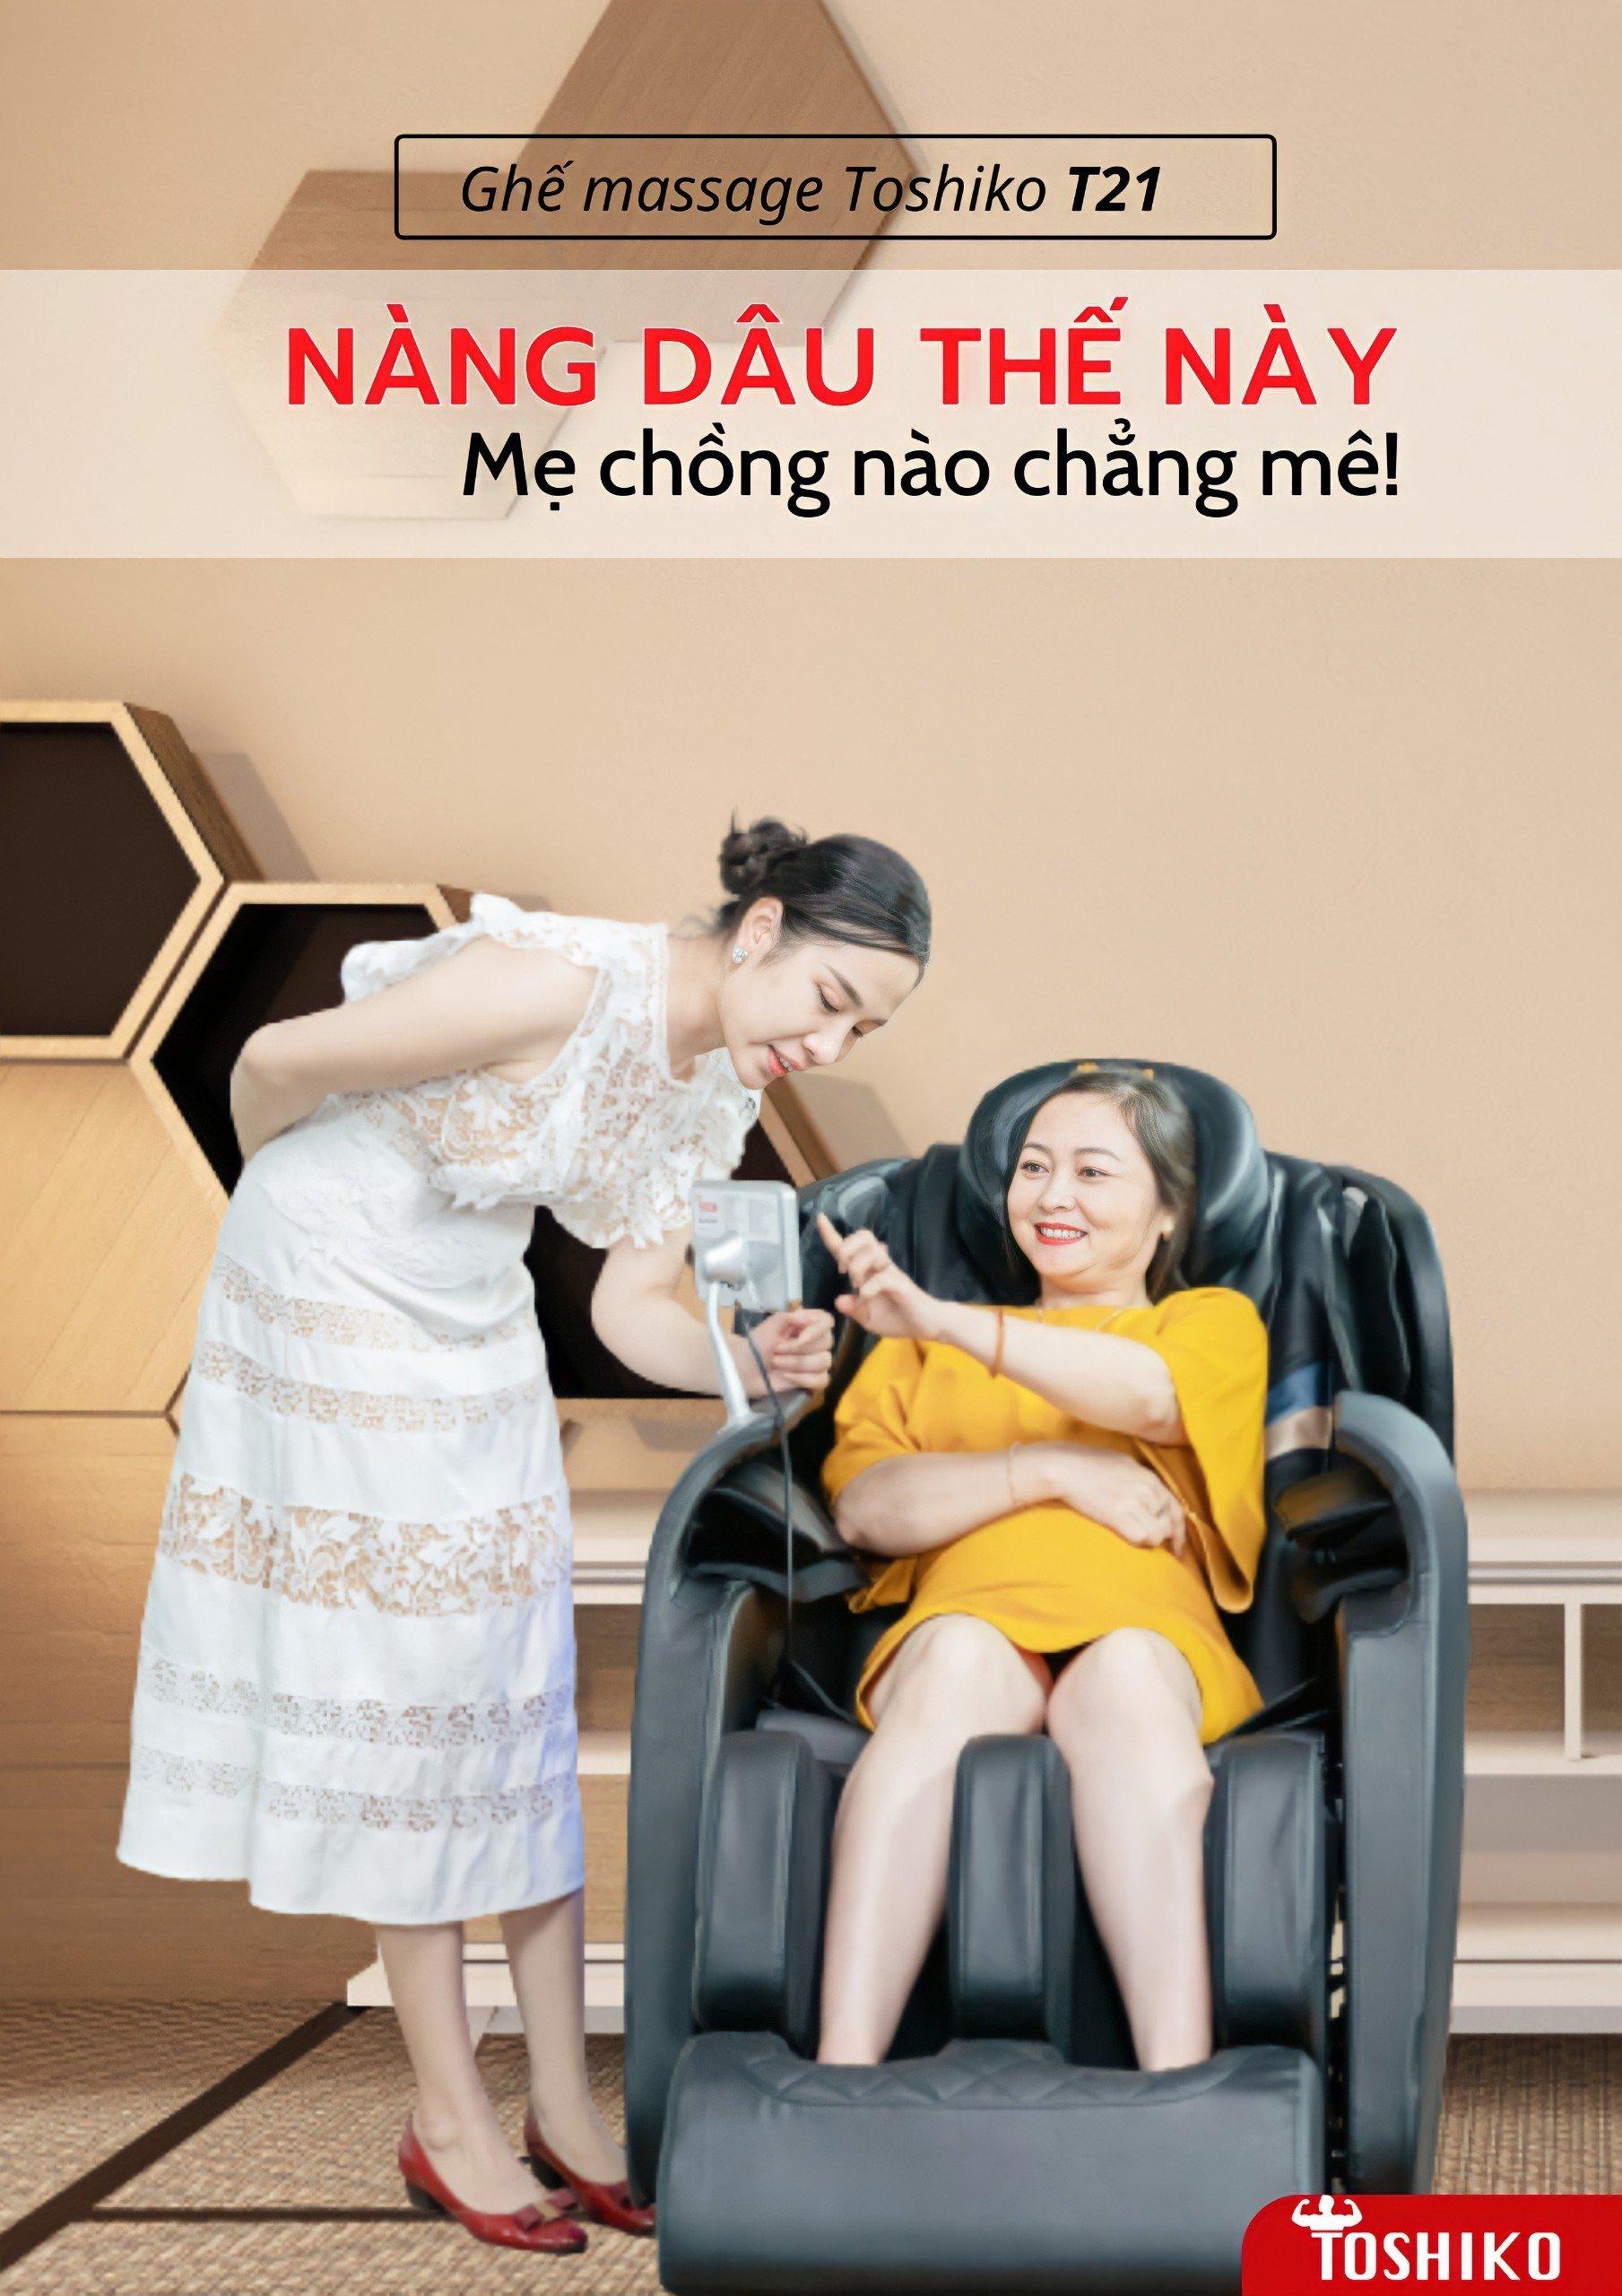 Mua ghế massage chất lượng-2